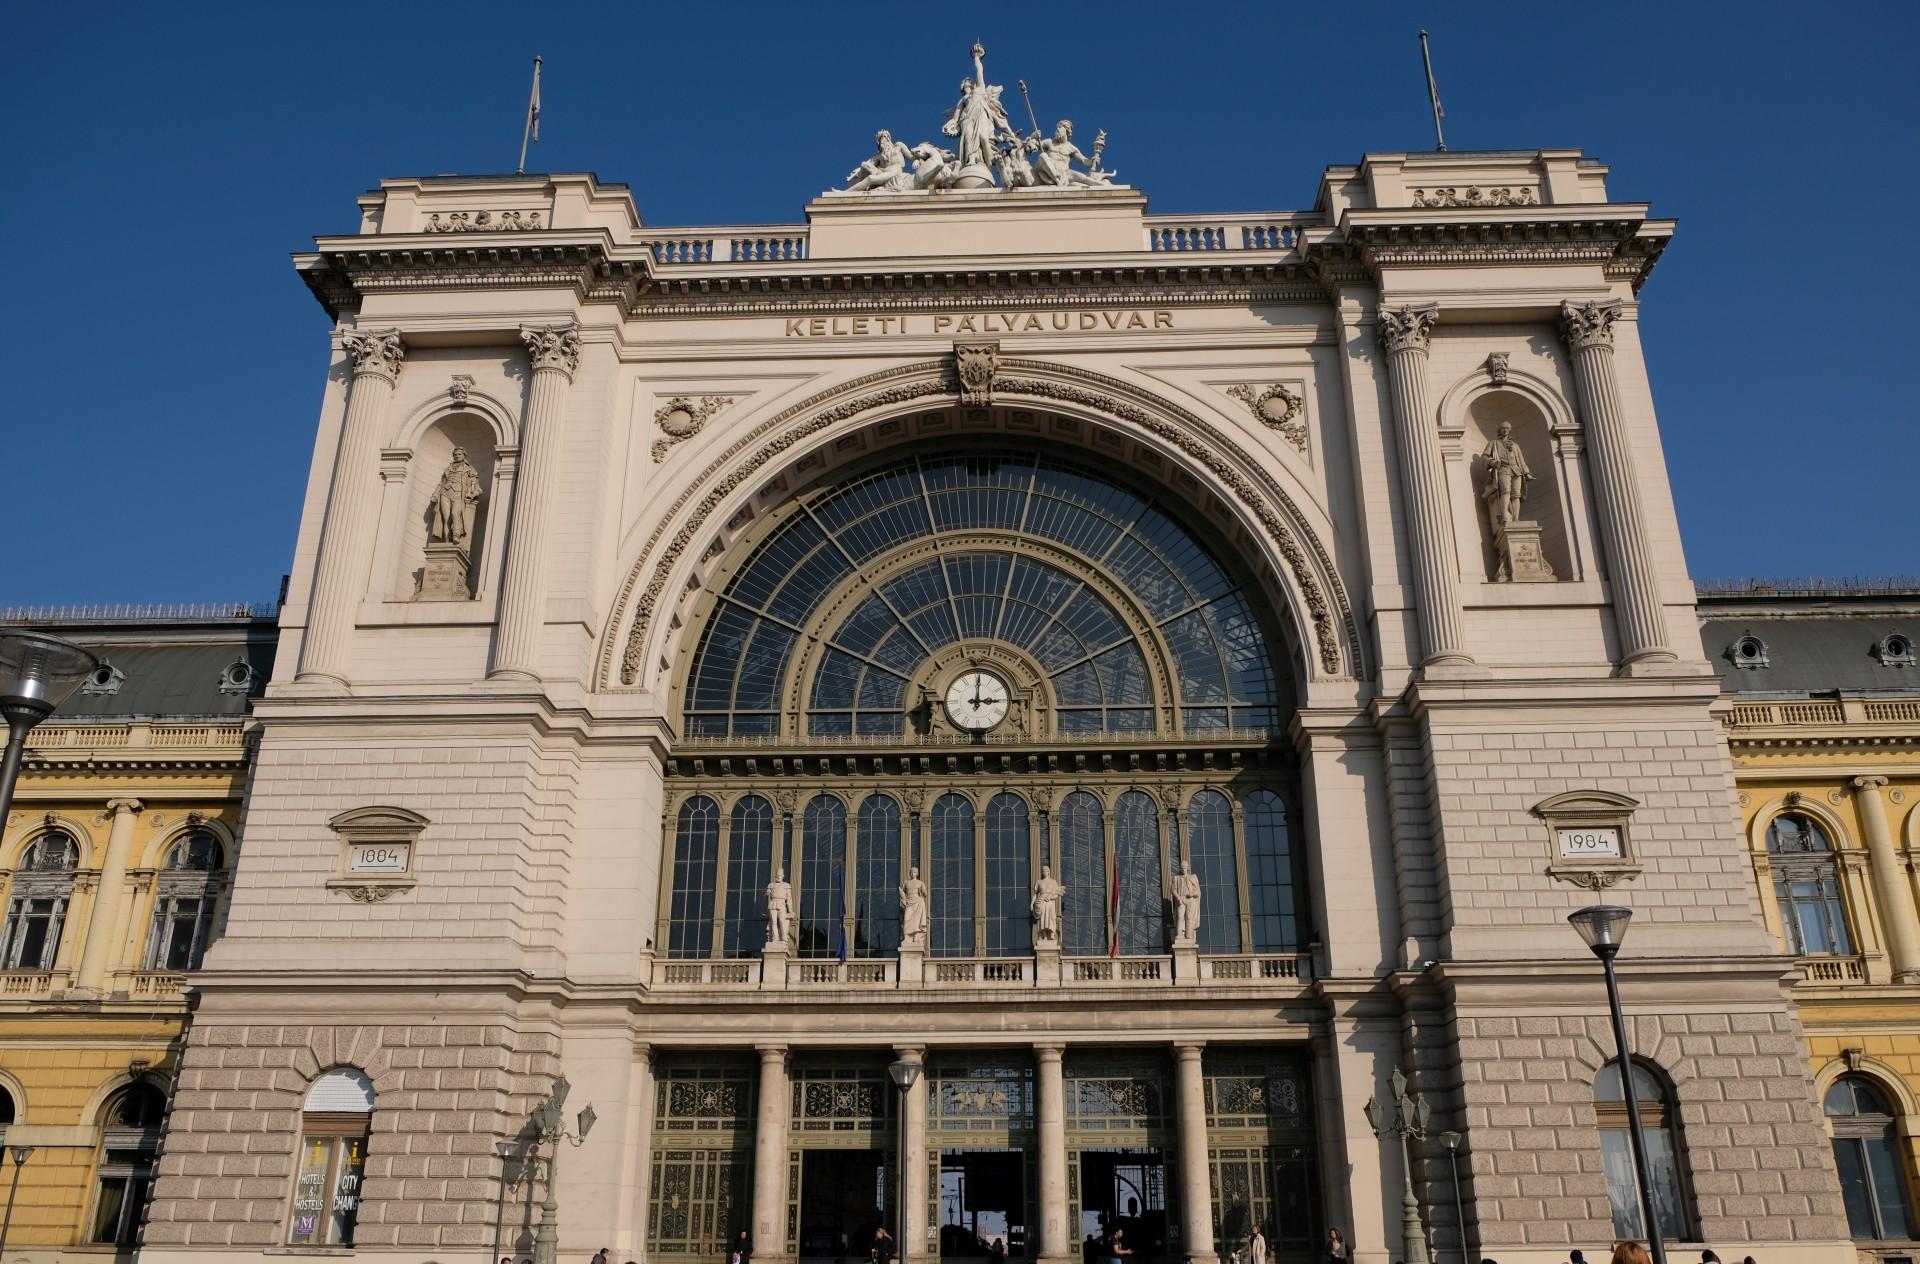 Der Bahnhof Keleti in Budapest